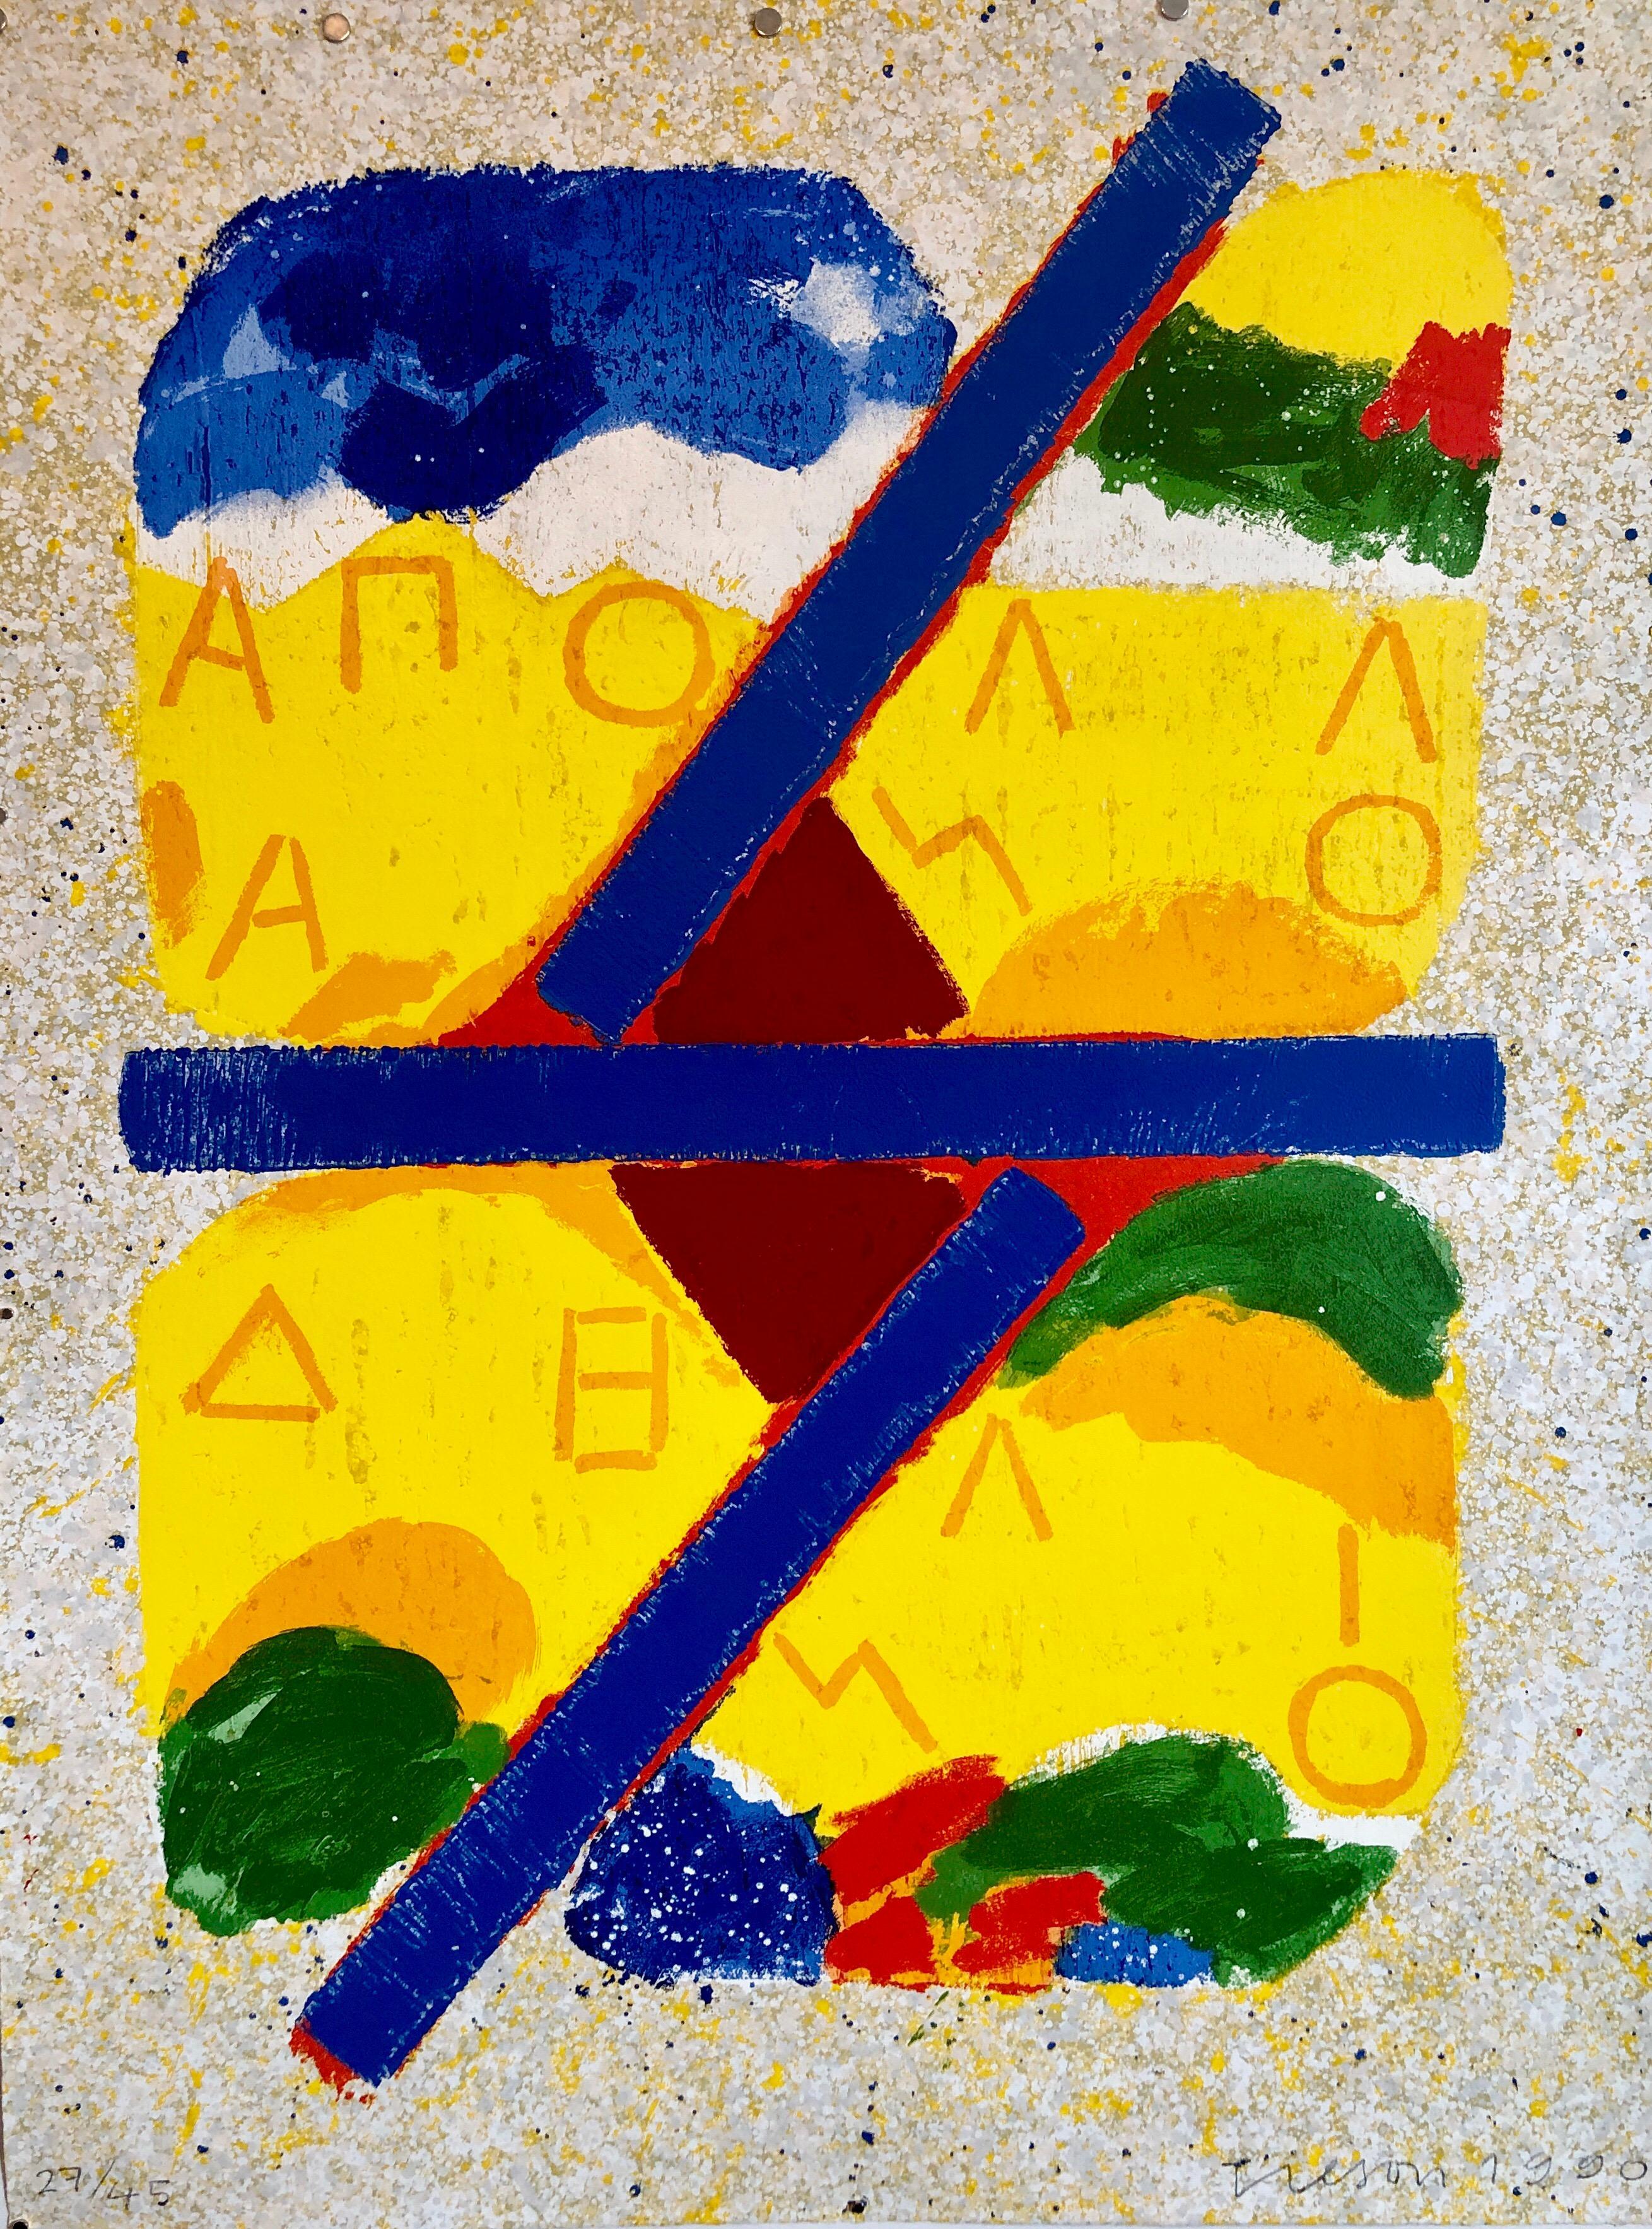 Vibrant Joe Tilson British Pop Art Screenprint, Woodblock, Colorful Print